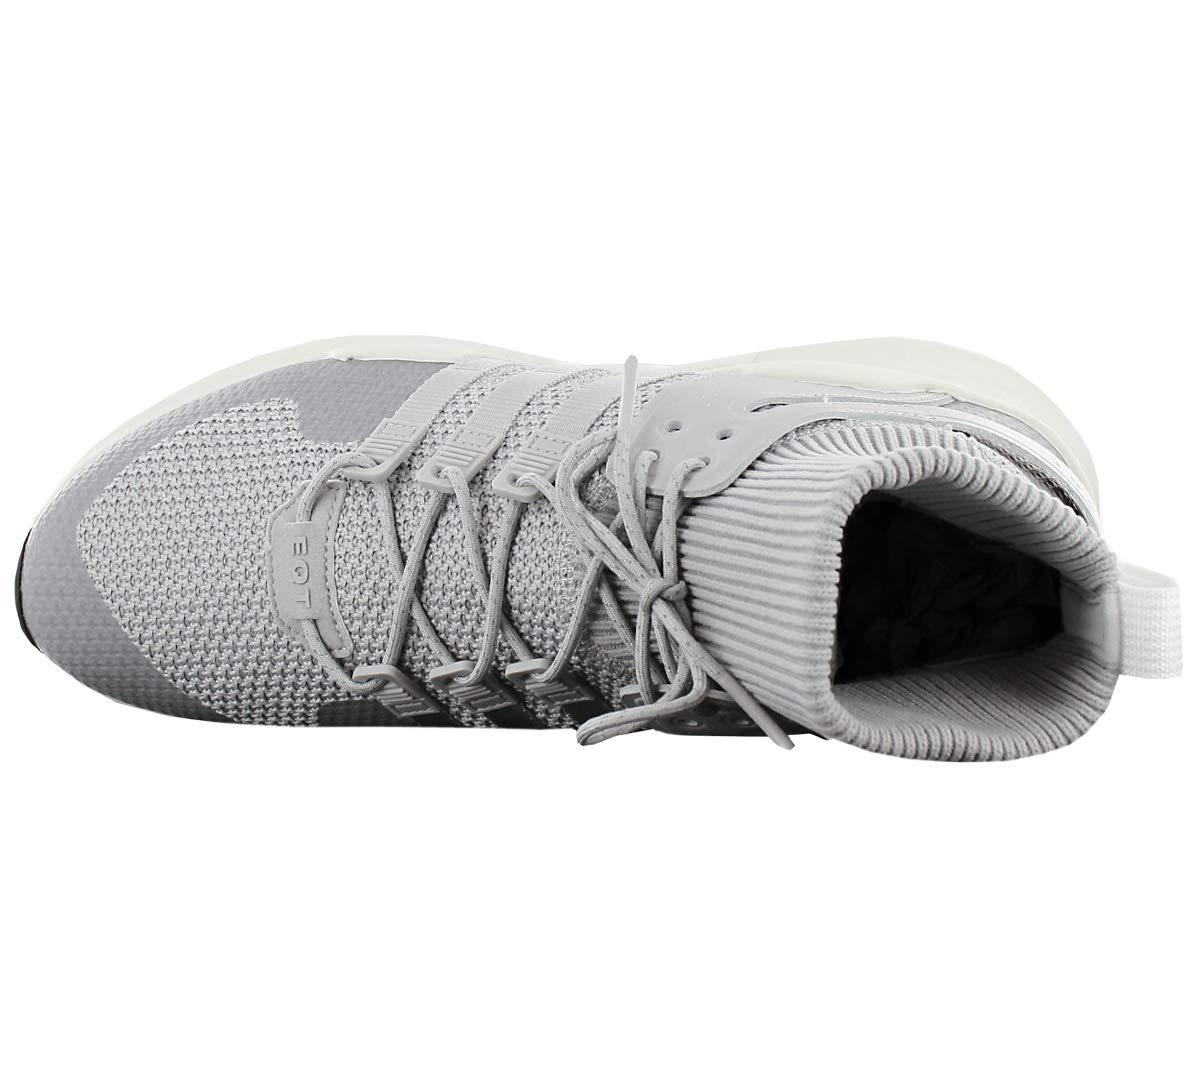 adidas EQT Support ADV Winter, Scarpe da Fitness Uomo 5 spesavip